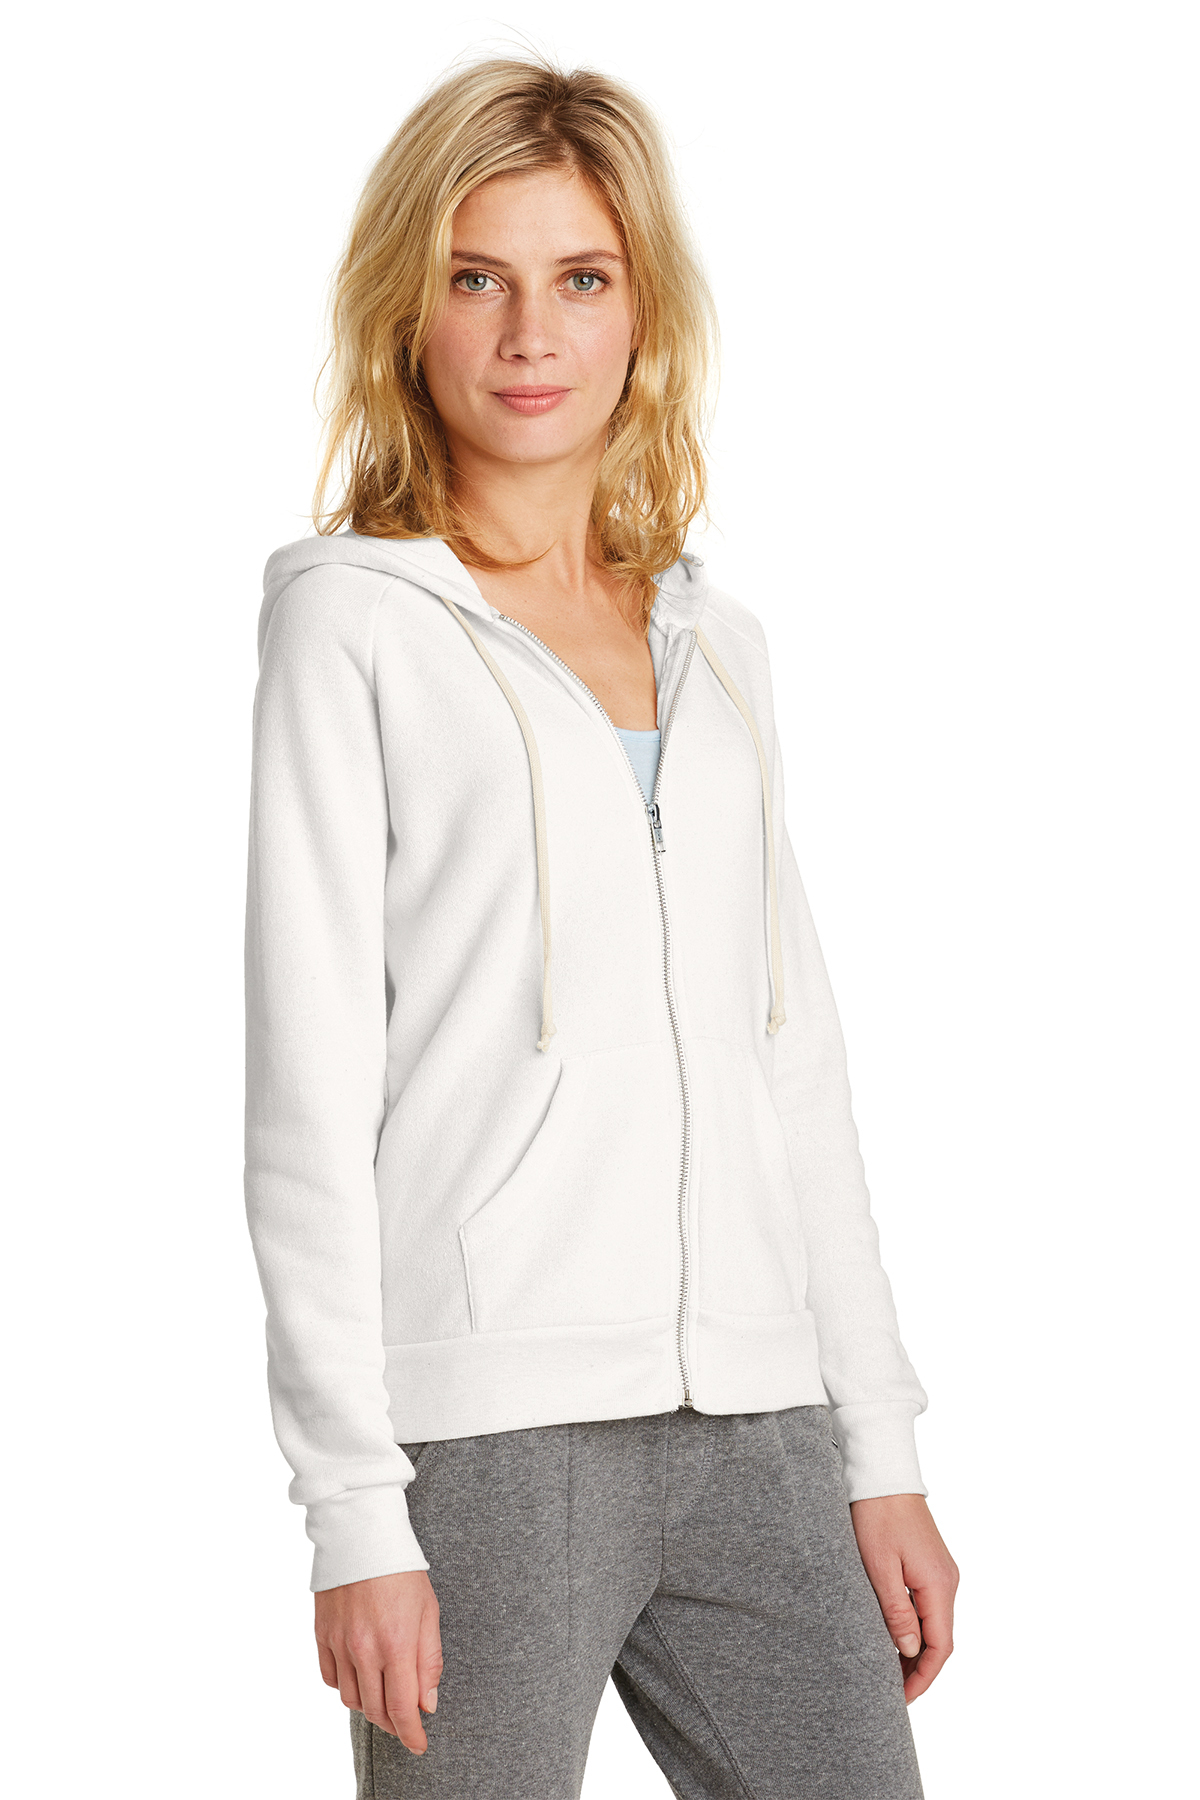 S Alternative Femme Eco-Polaire Adrian Full-Zip Sweat-shirt 9573-ECO noir M L